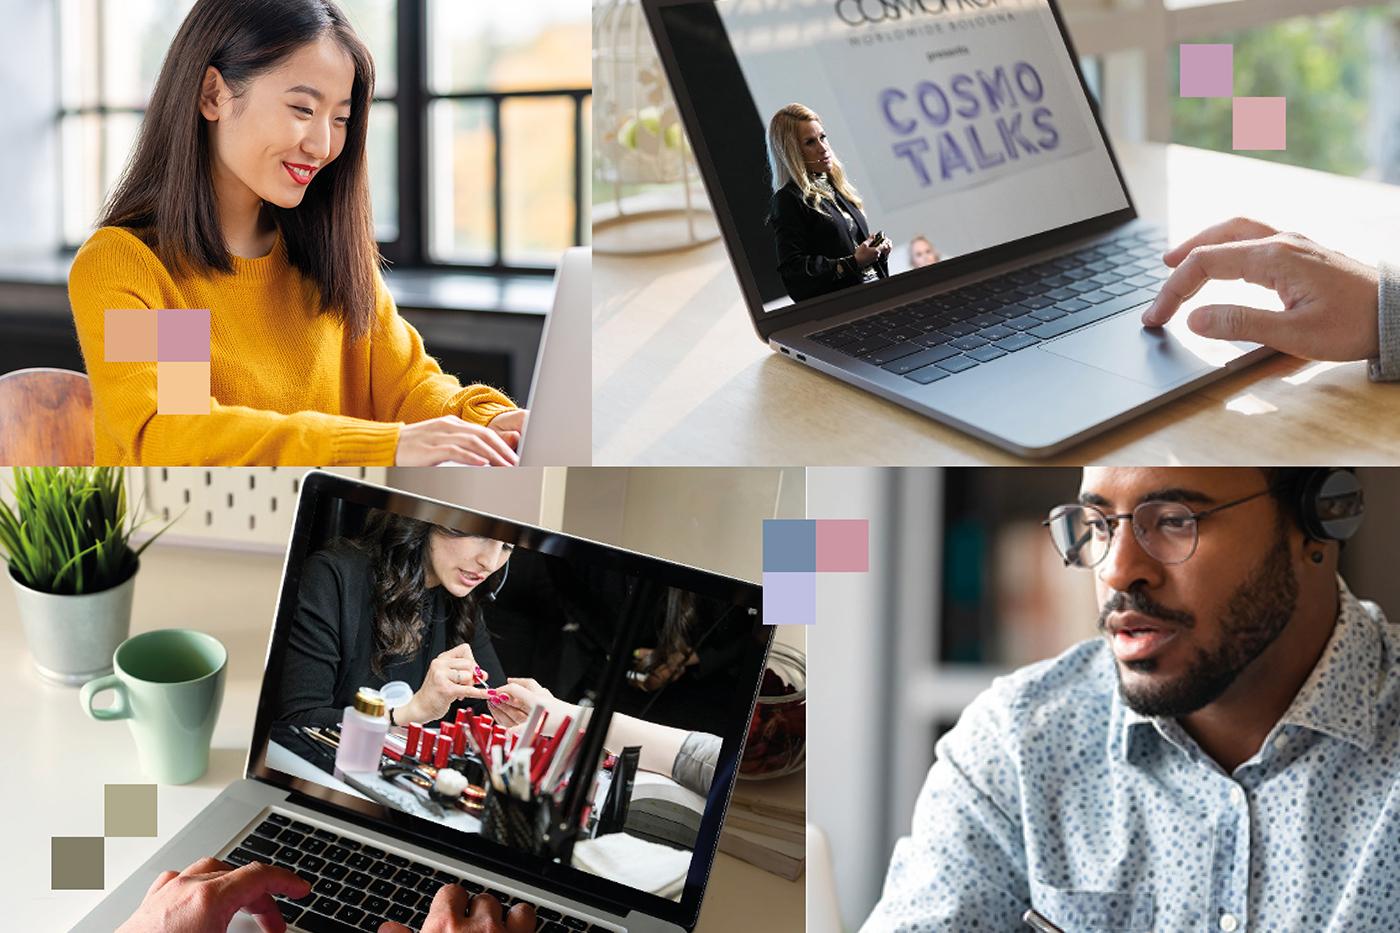 Cosmoprof presents WeCosmoprof International from June 7 to 18, 2021